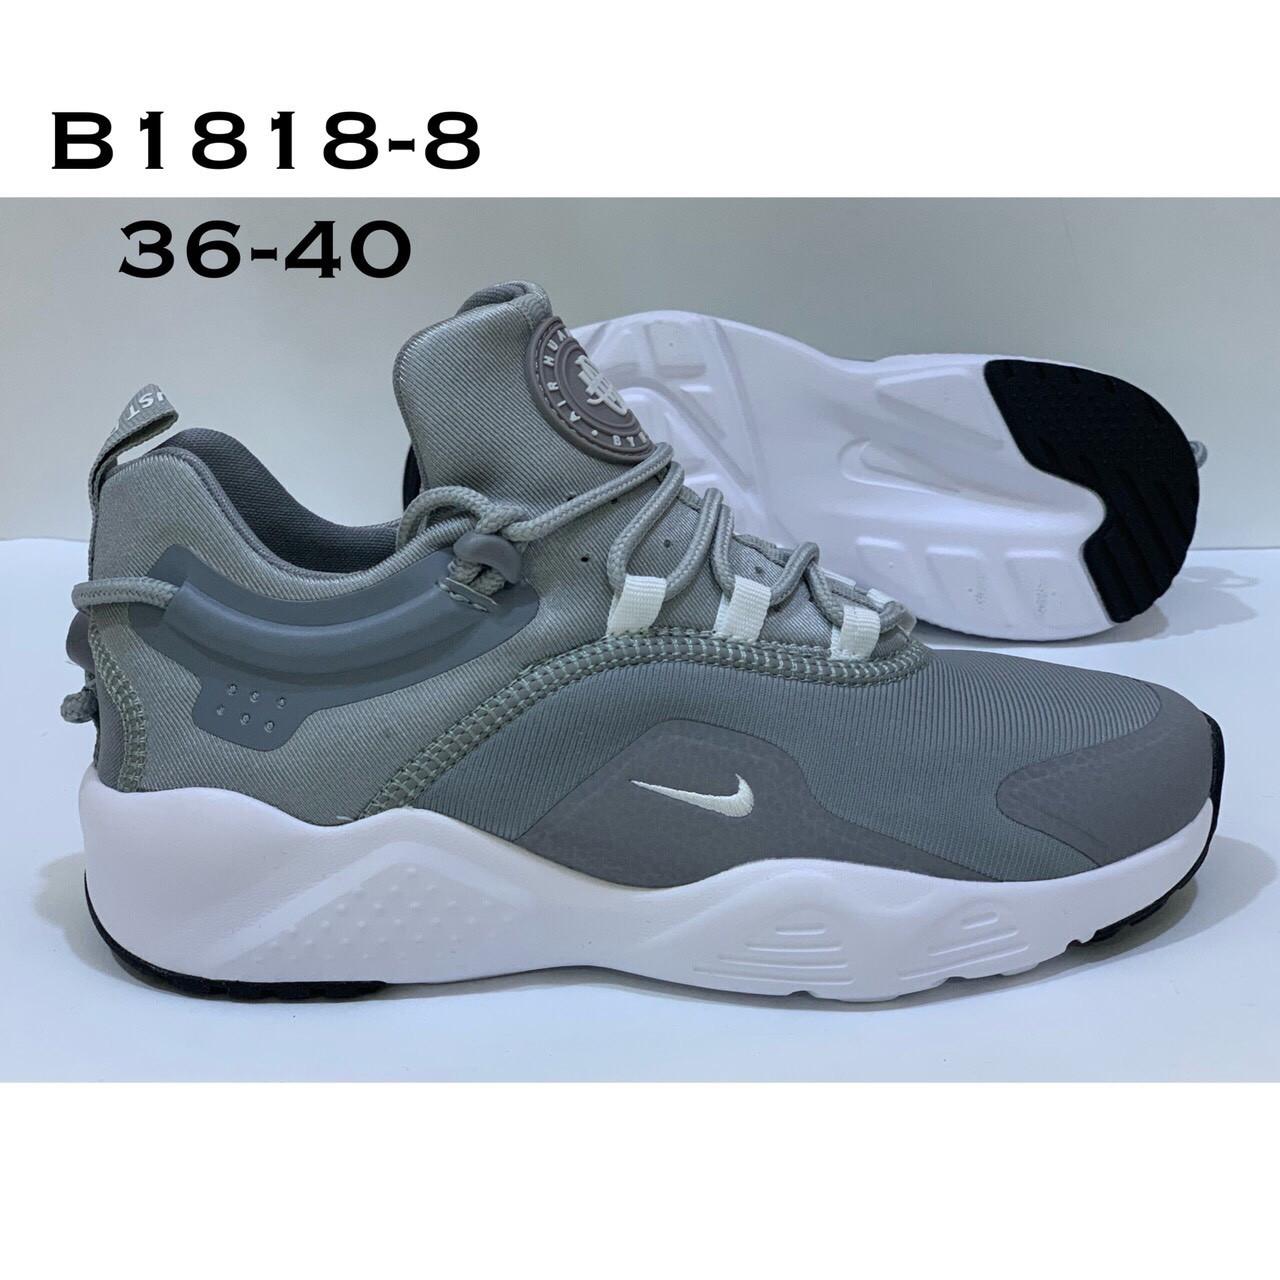 Кроссовки подросток Nike  Huarache Just Do It оптом (36-40)